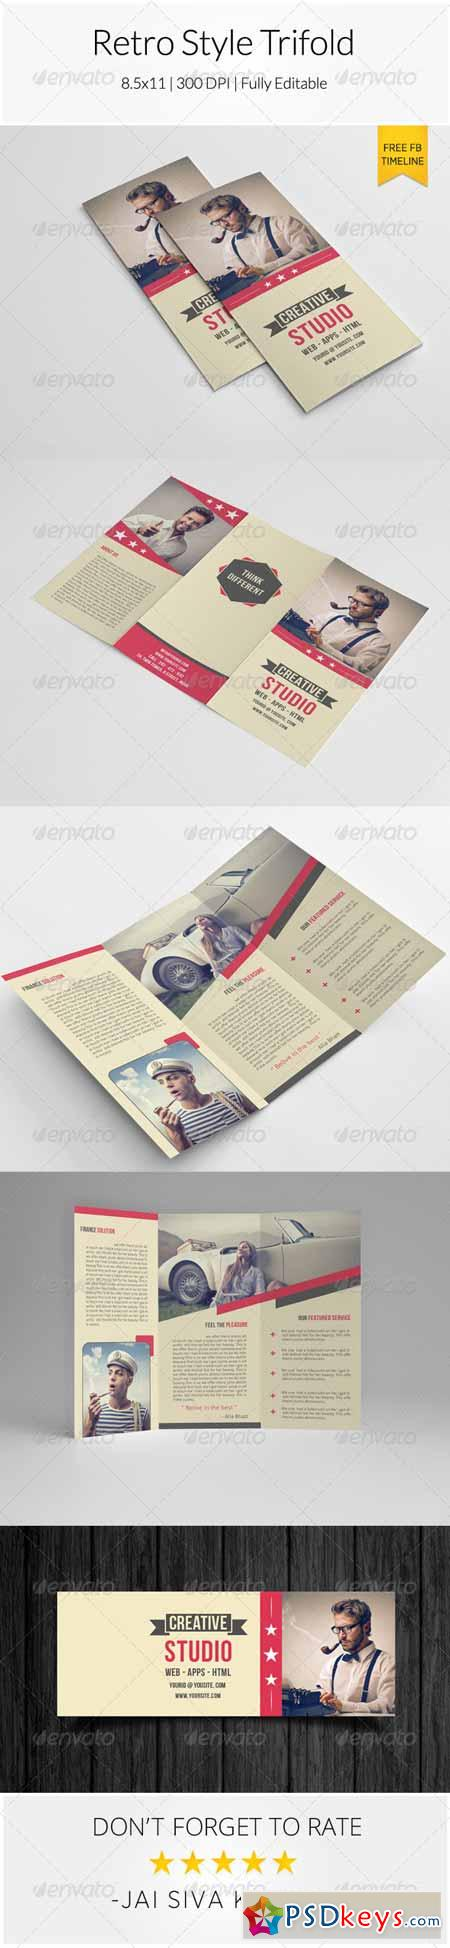 Retro Style Trifold Brochure 8174601